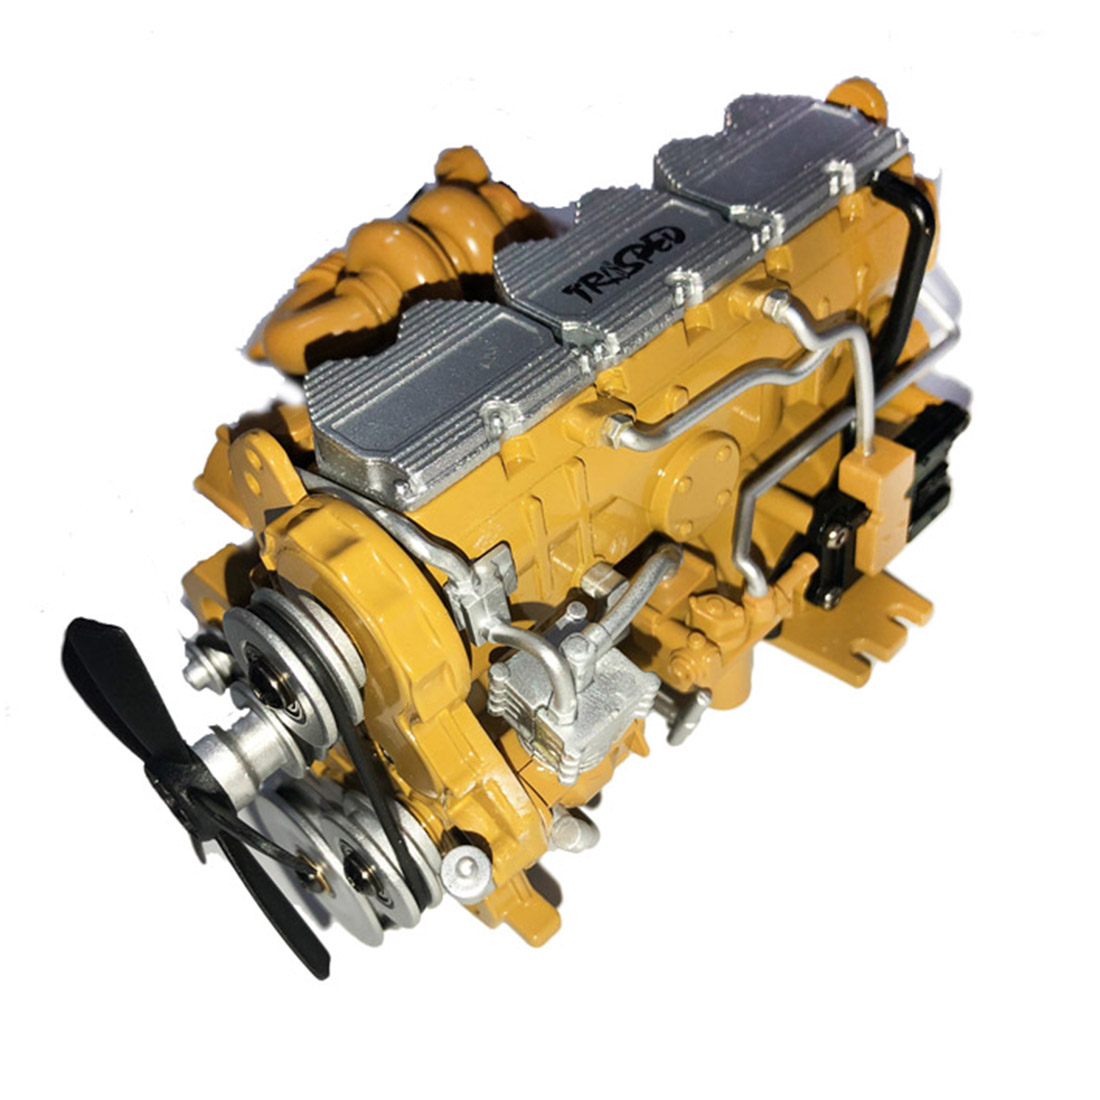 Zinc Alloy Diesel Engine Model Kits For HG-P602 RC Car Model